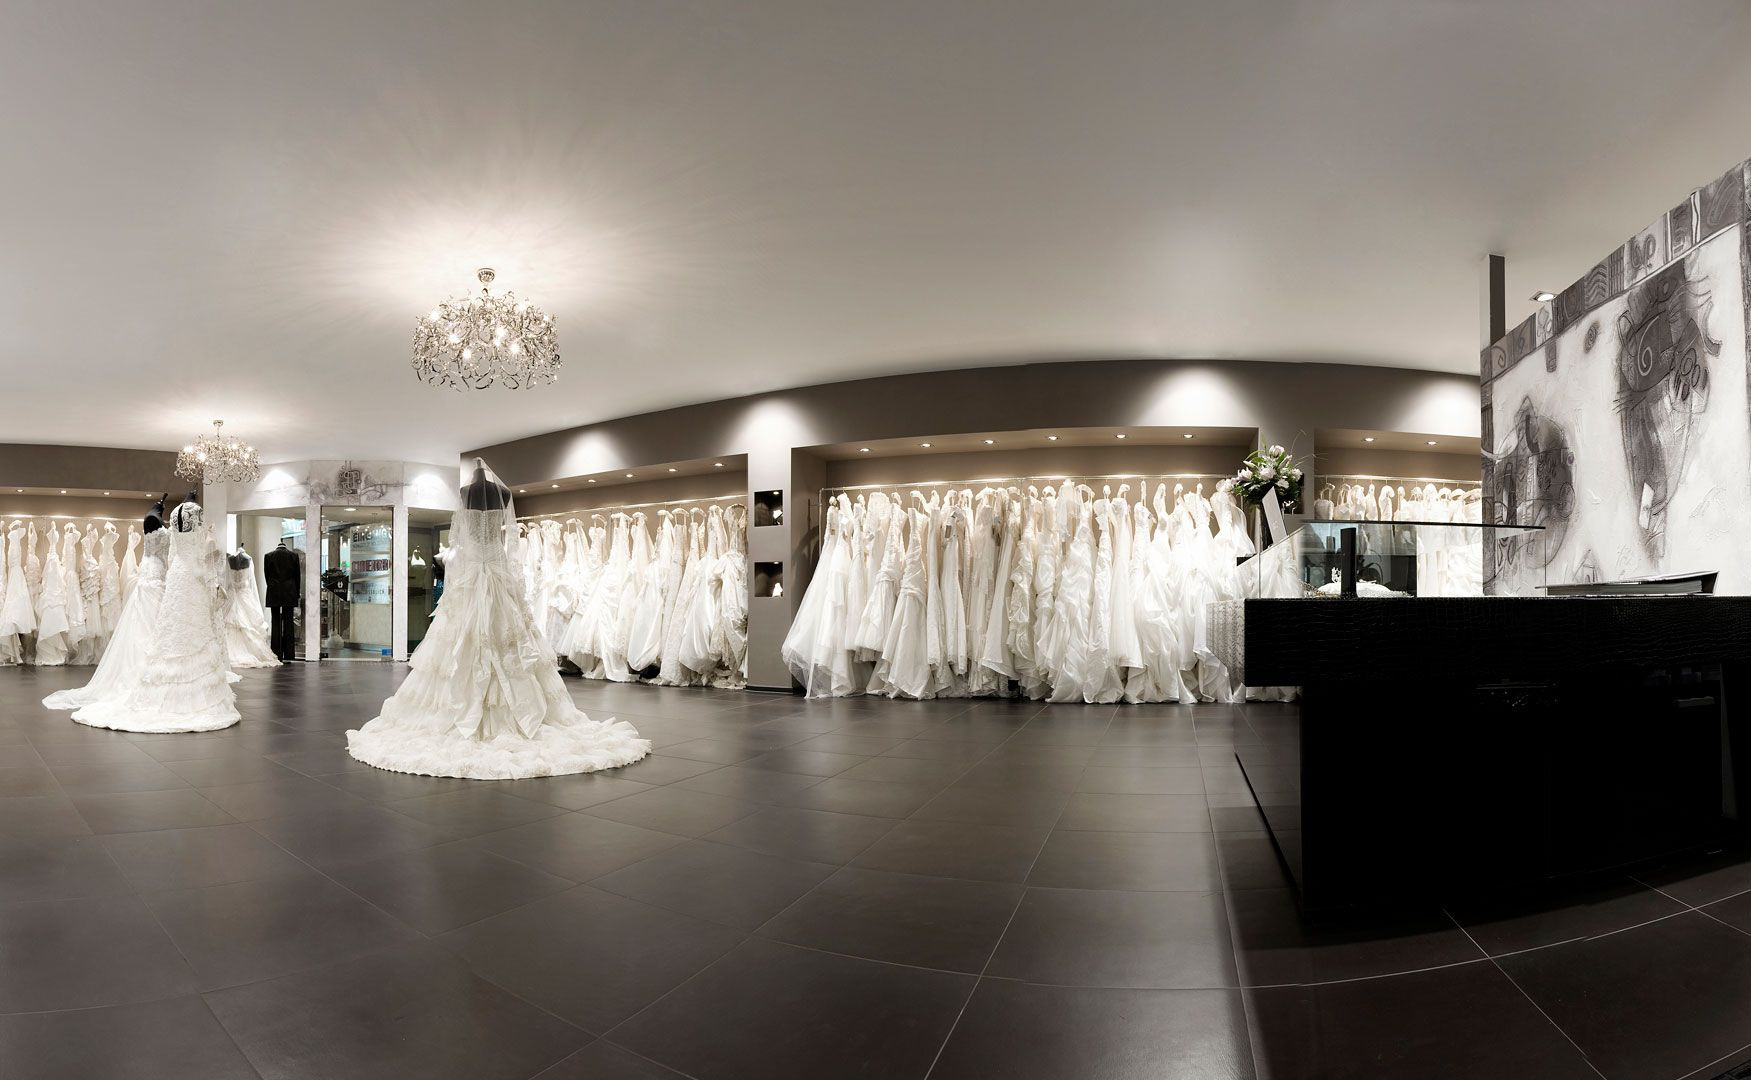 10 Genial Brautmode Shop VertriebFormal Schön Brautmode Shop Ärmel